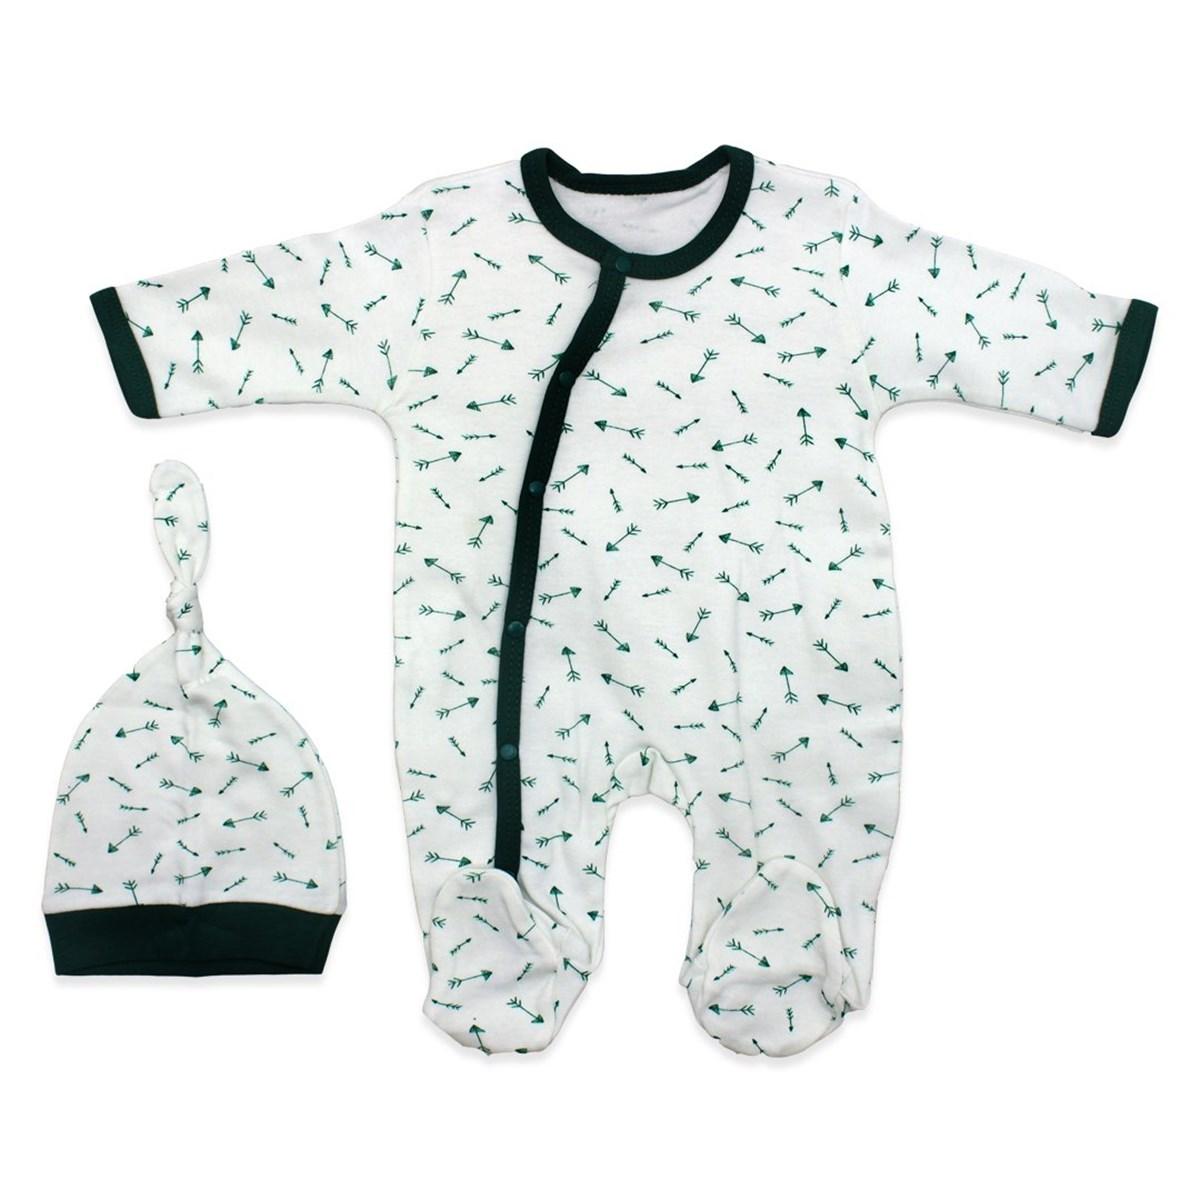 Baby's Printed White Romper